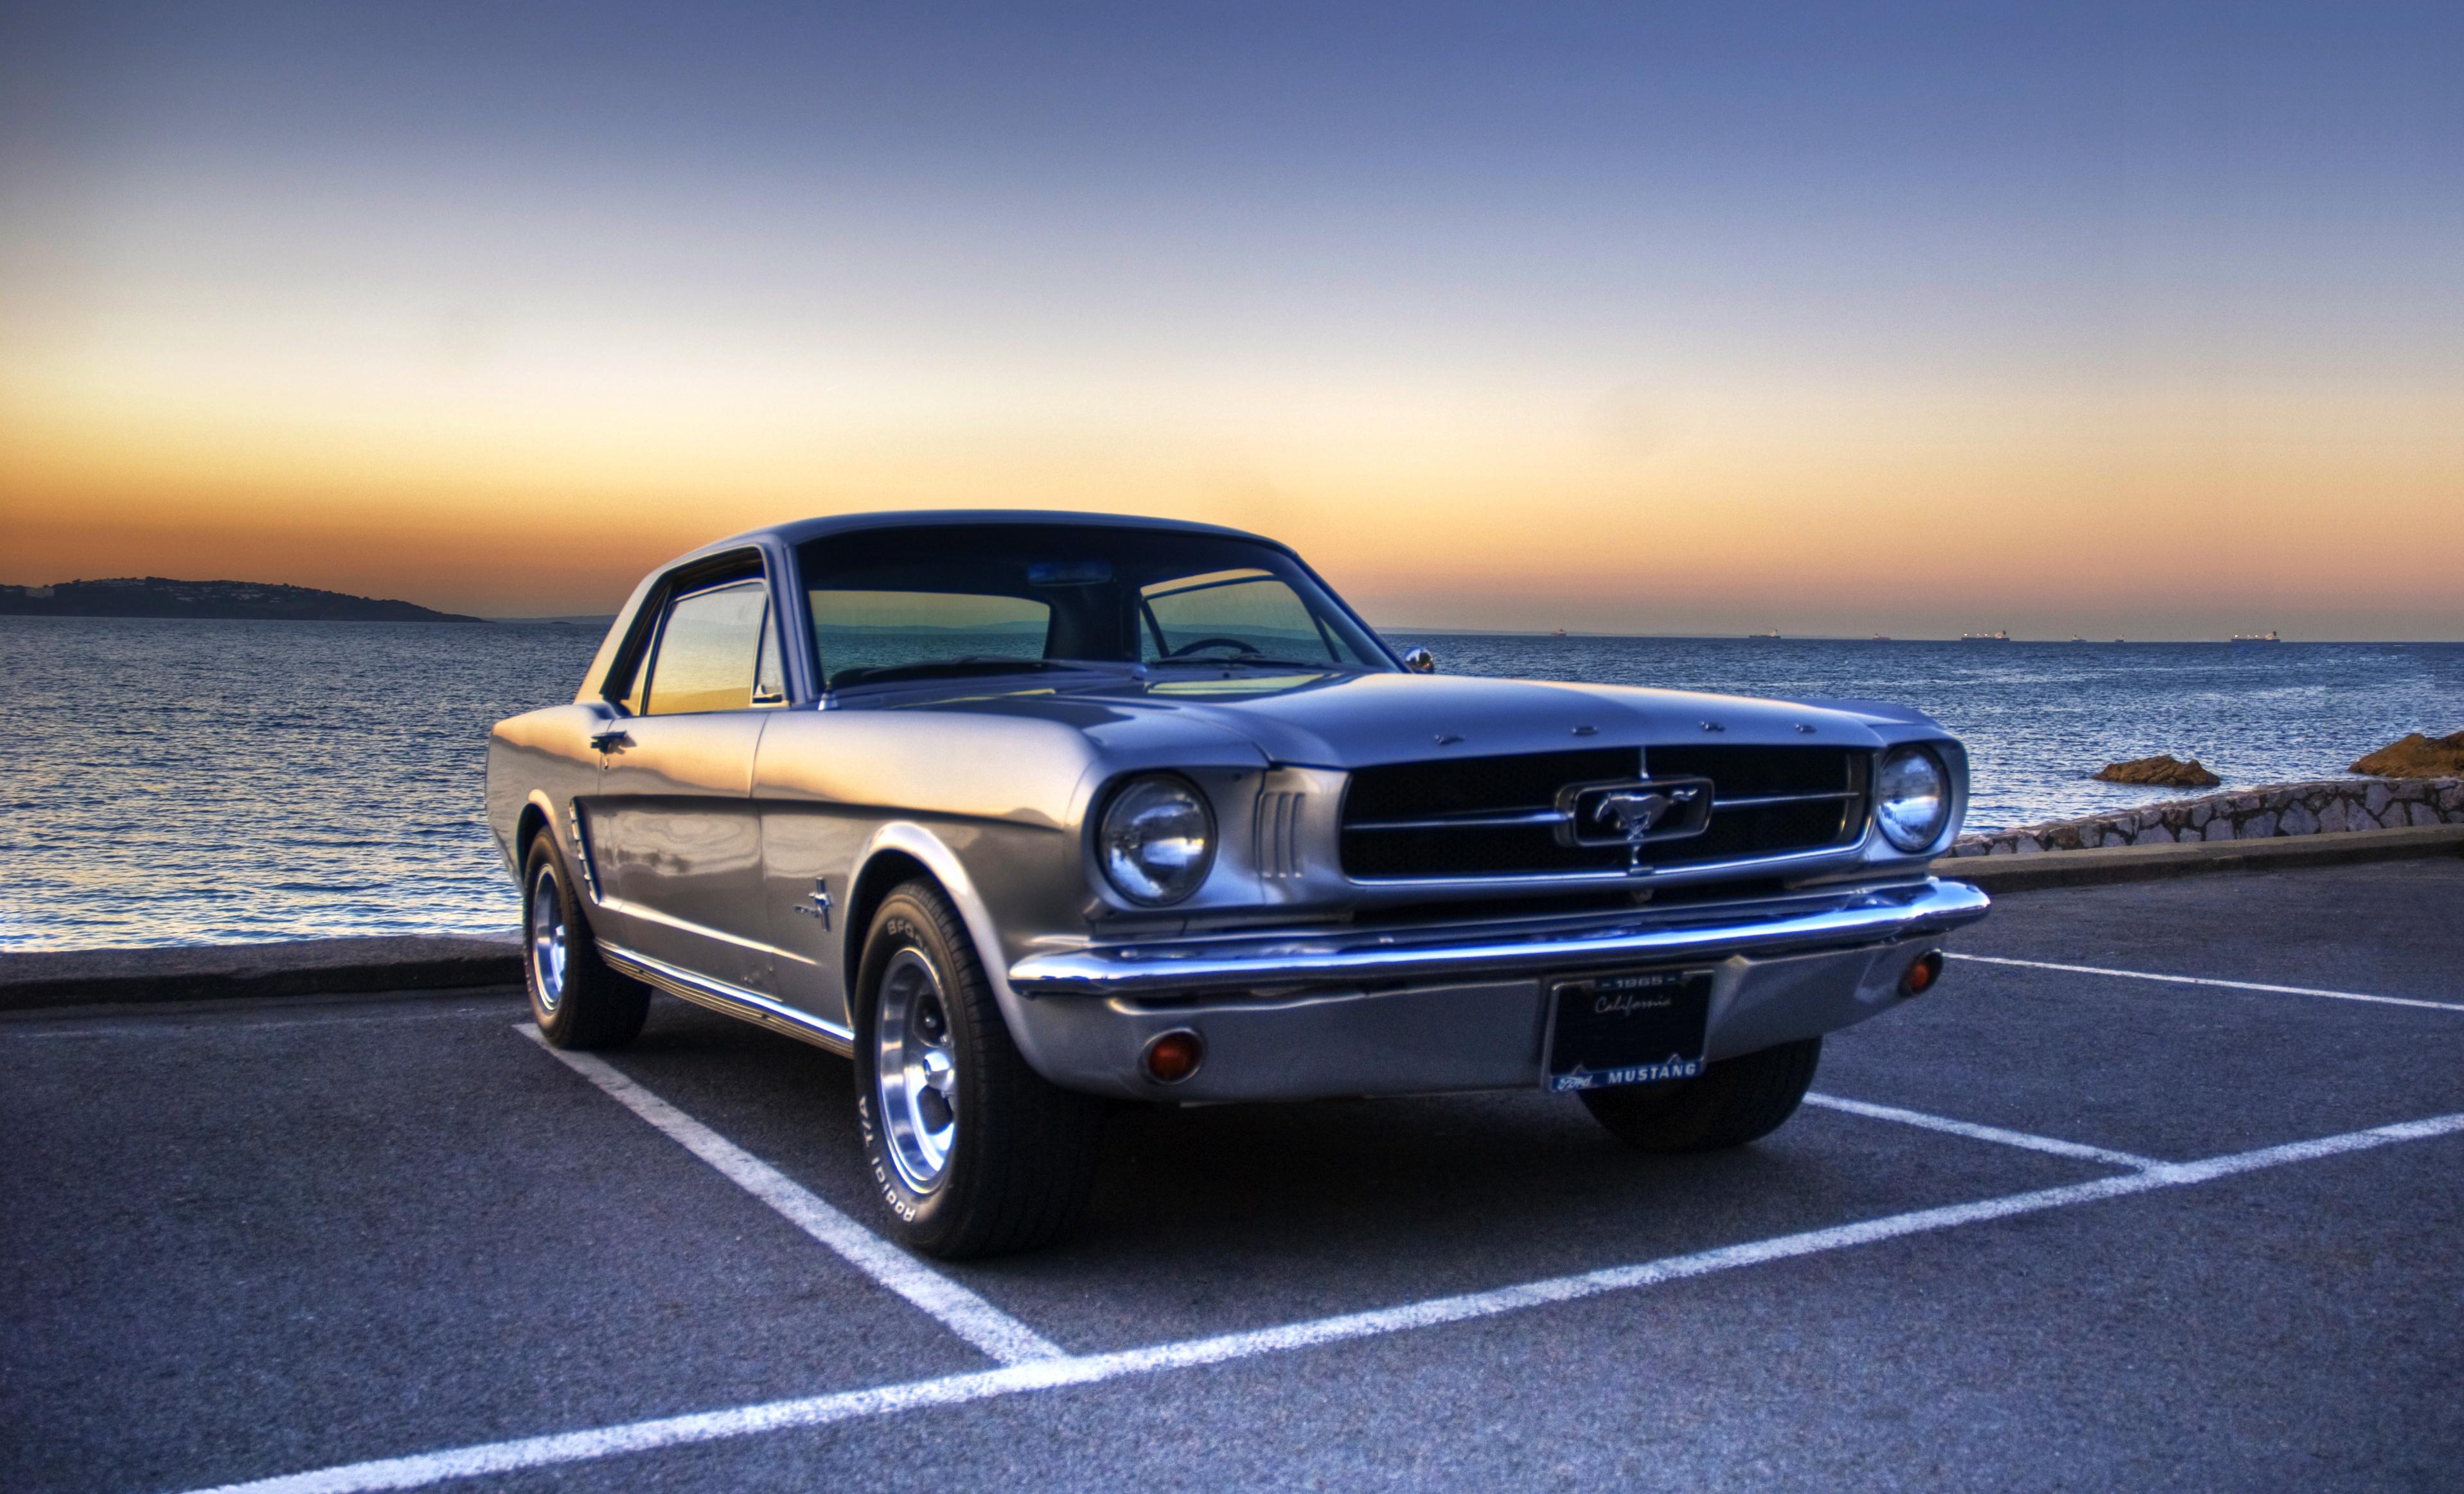 Wallpaper shop sunset sea HDR vintage sports car Ford